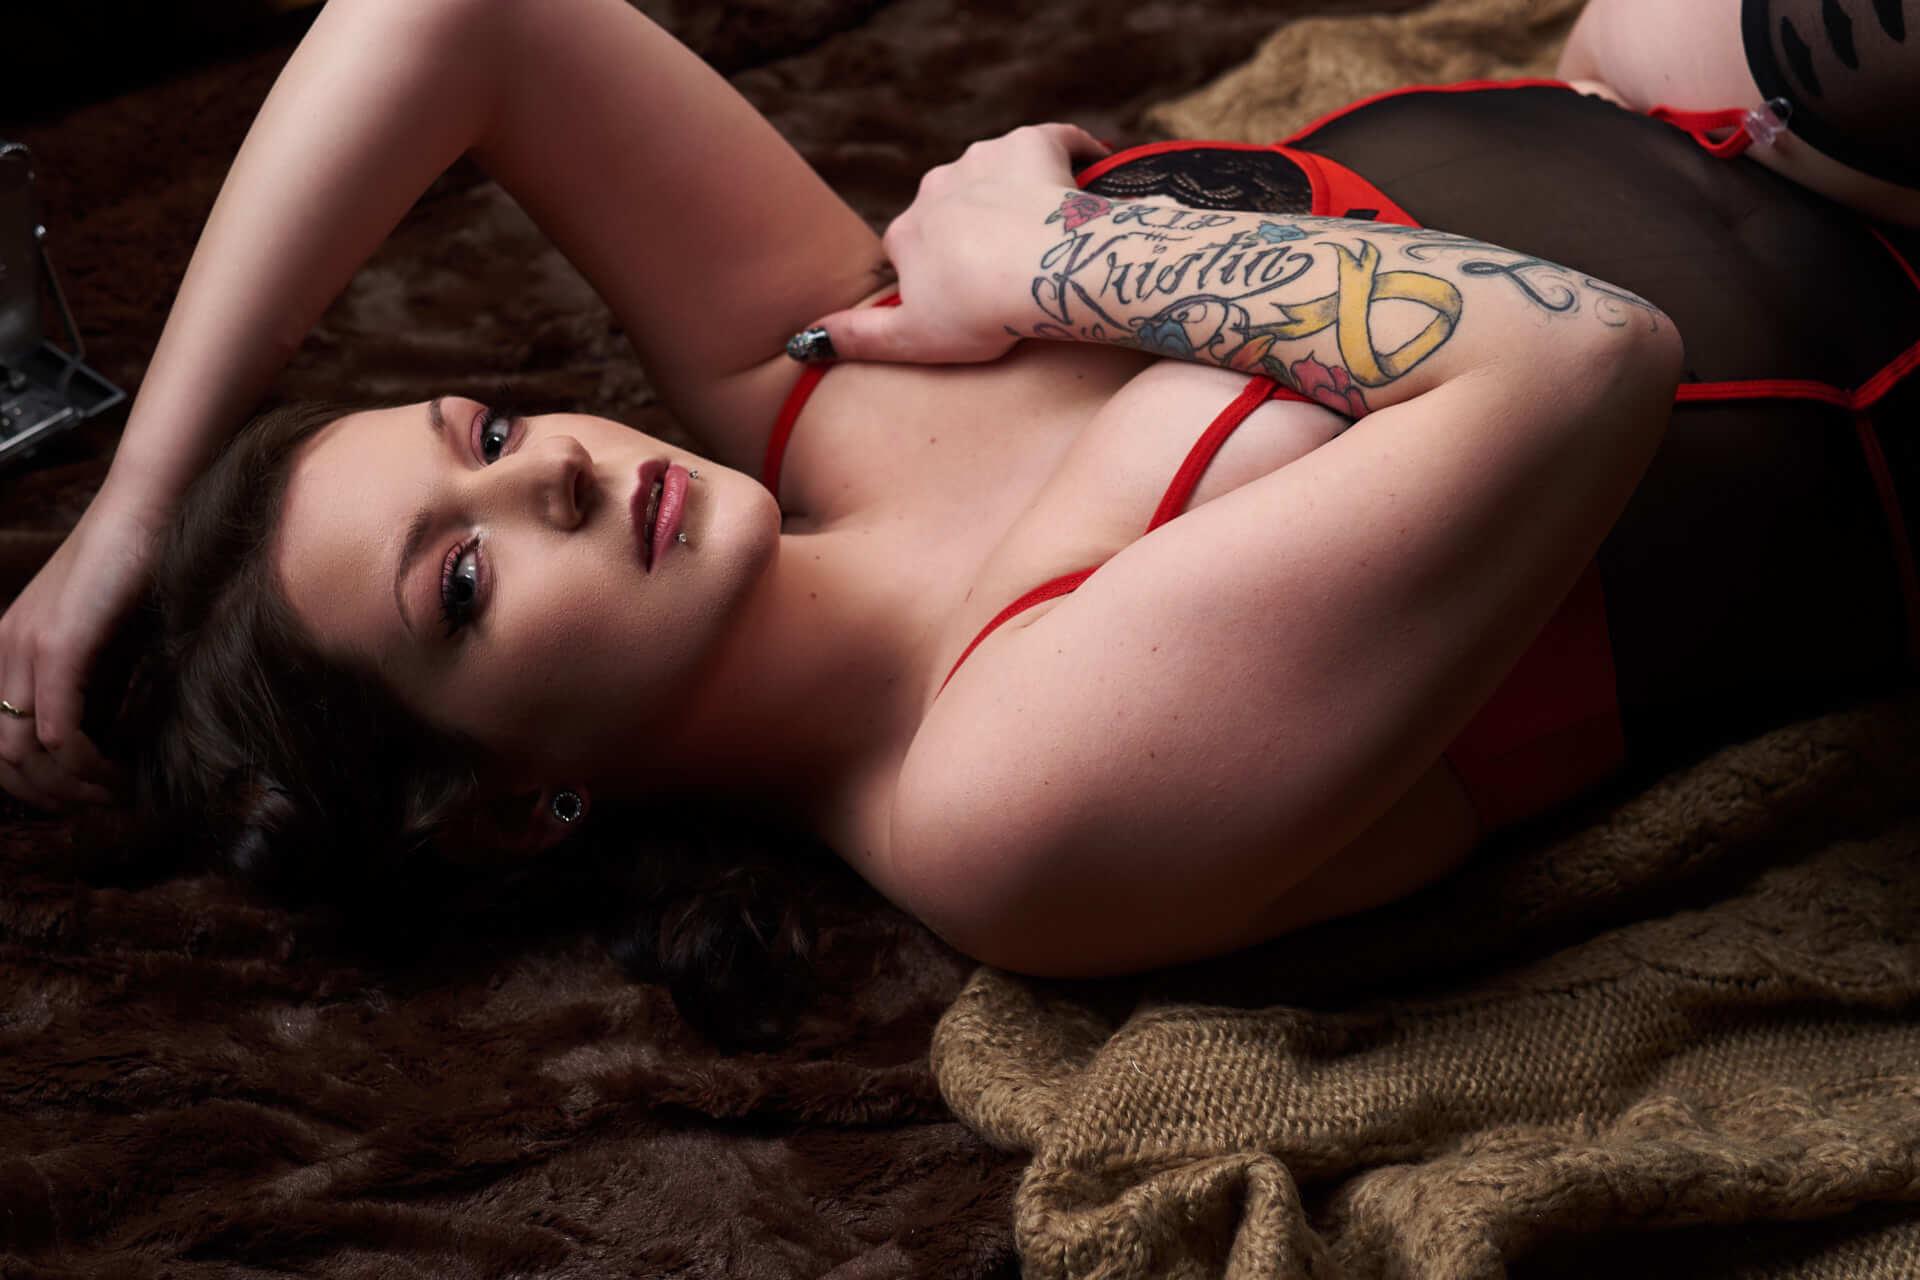 toronto boudoir. intimate portrait photography sensual bedroom photo luxury sexy